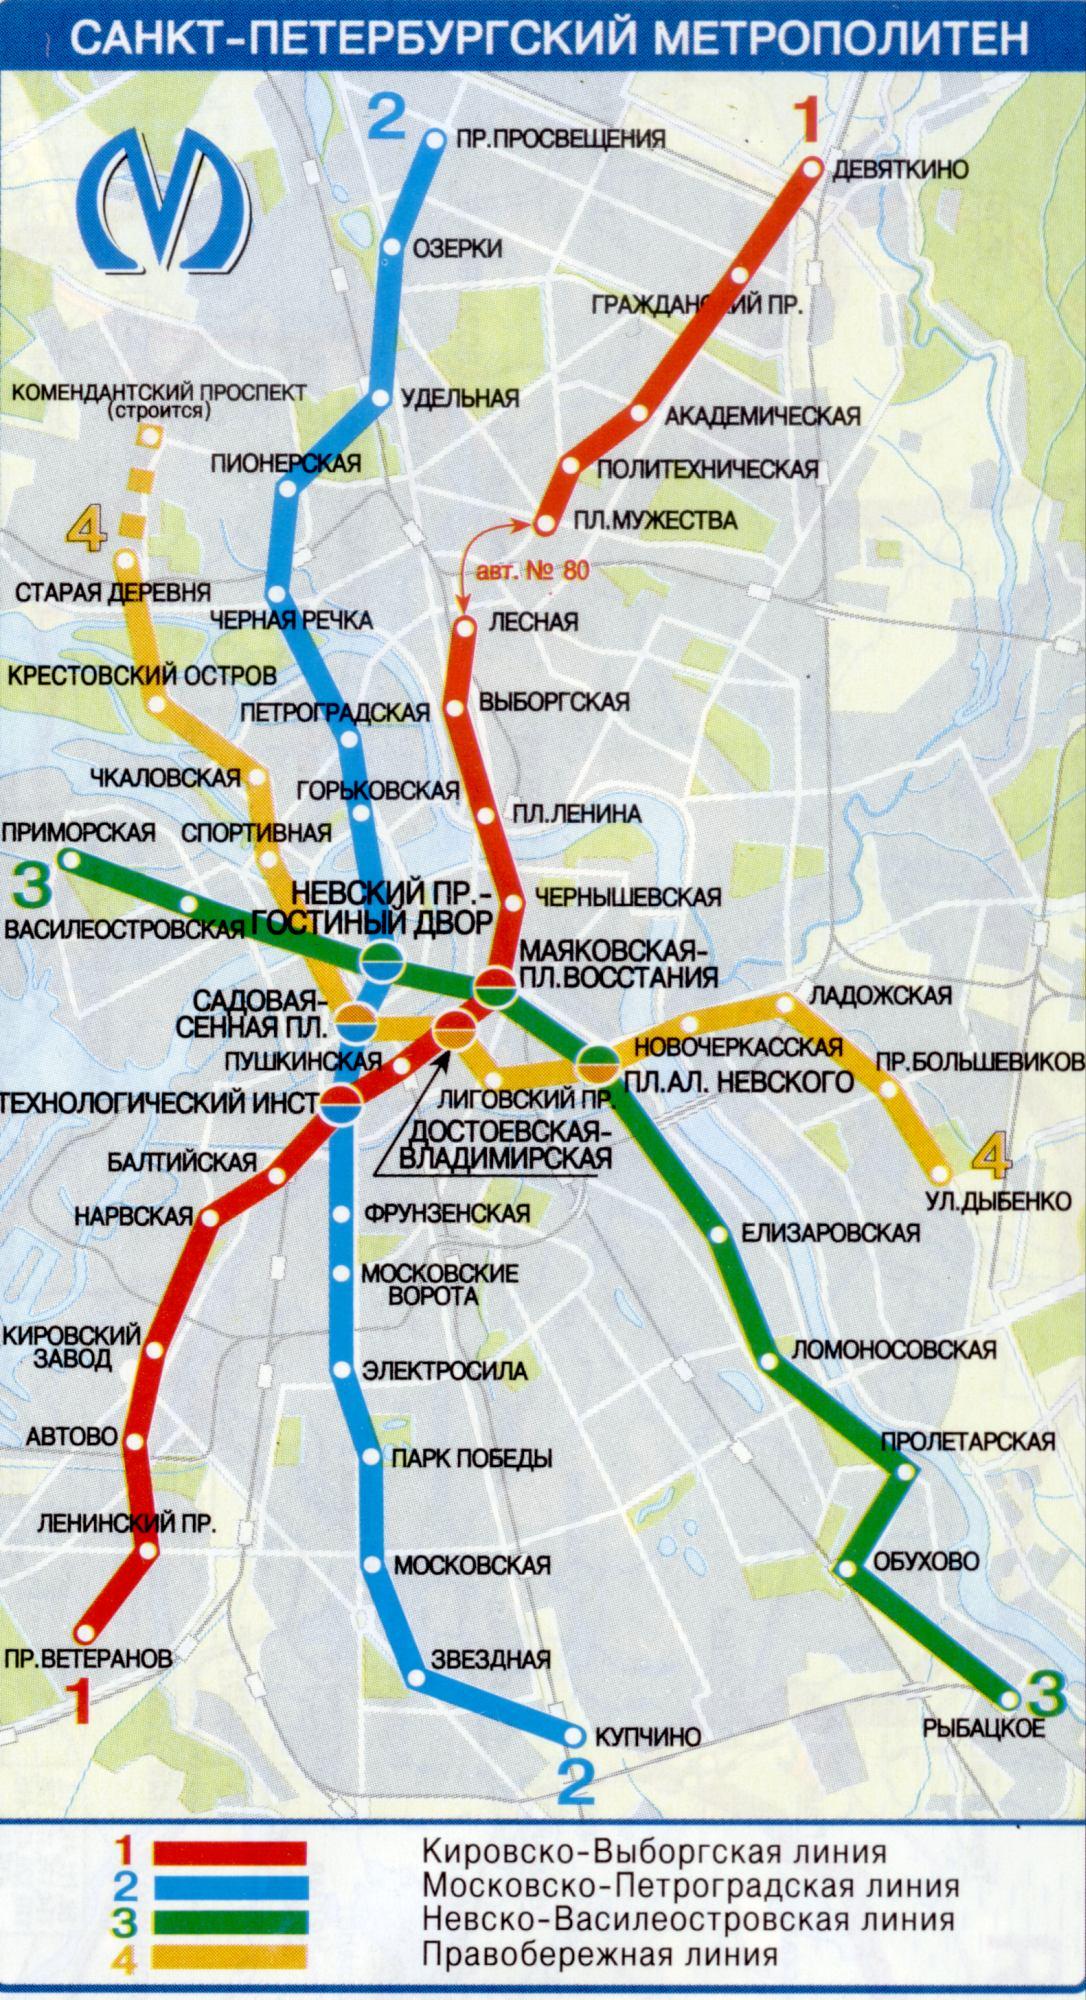 фото схема метро санкт-петербург